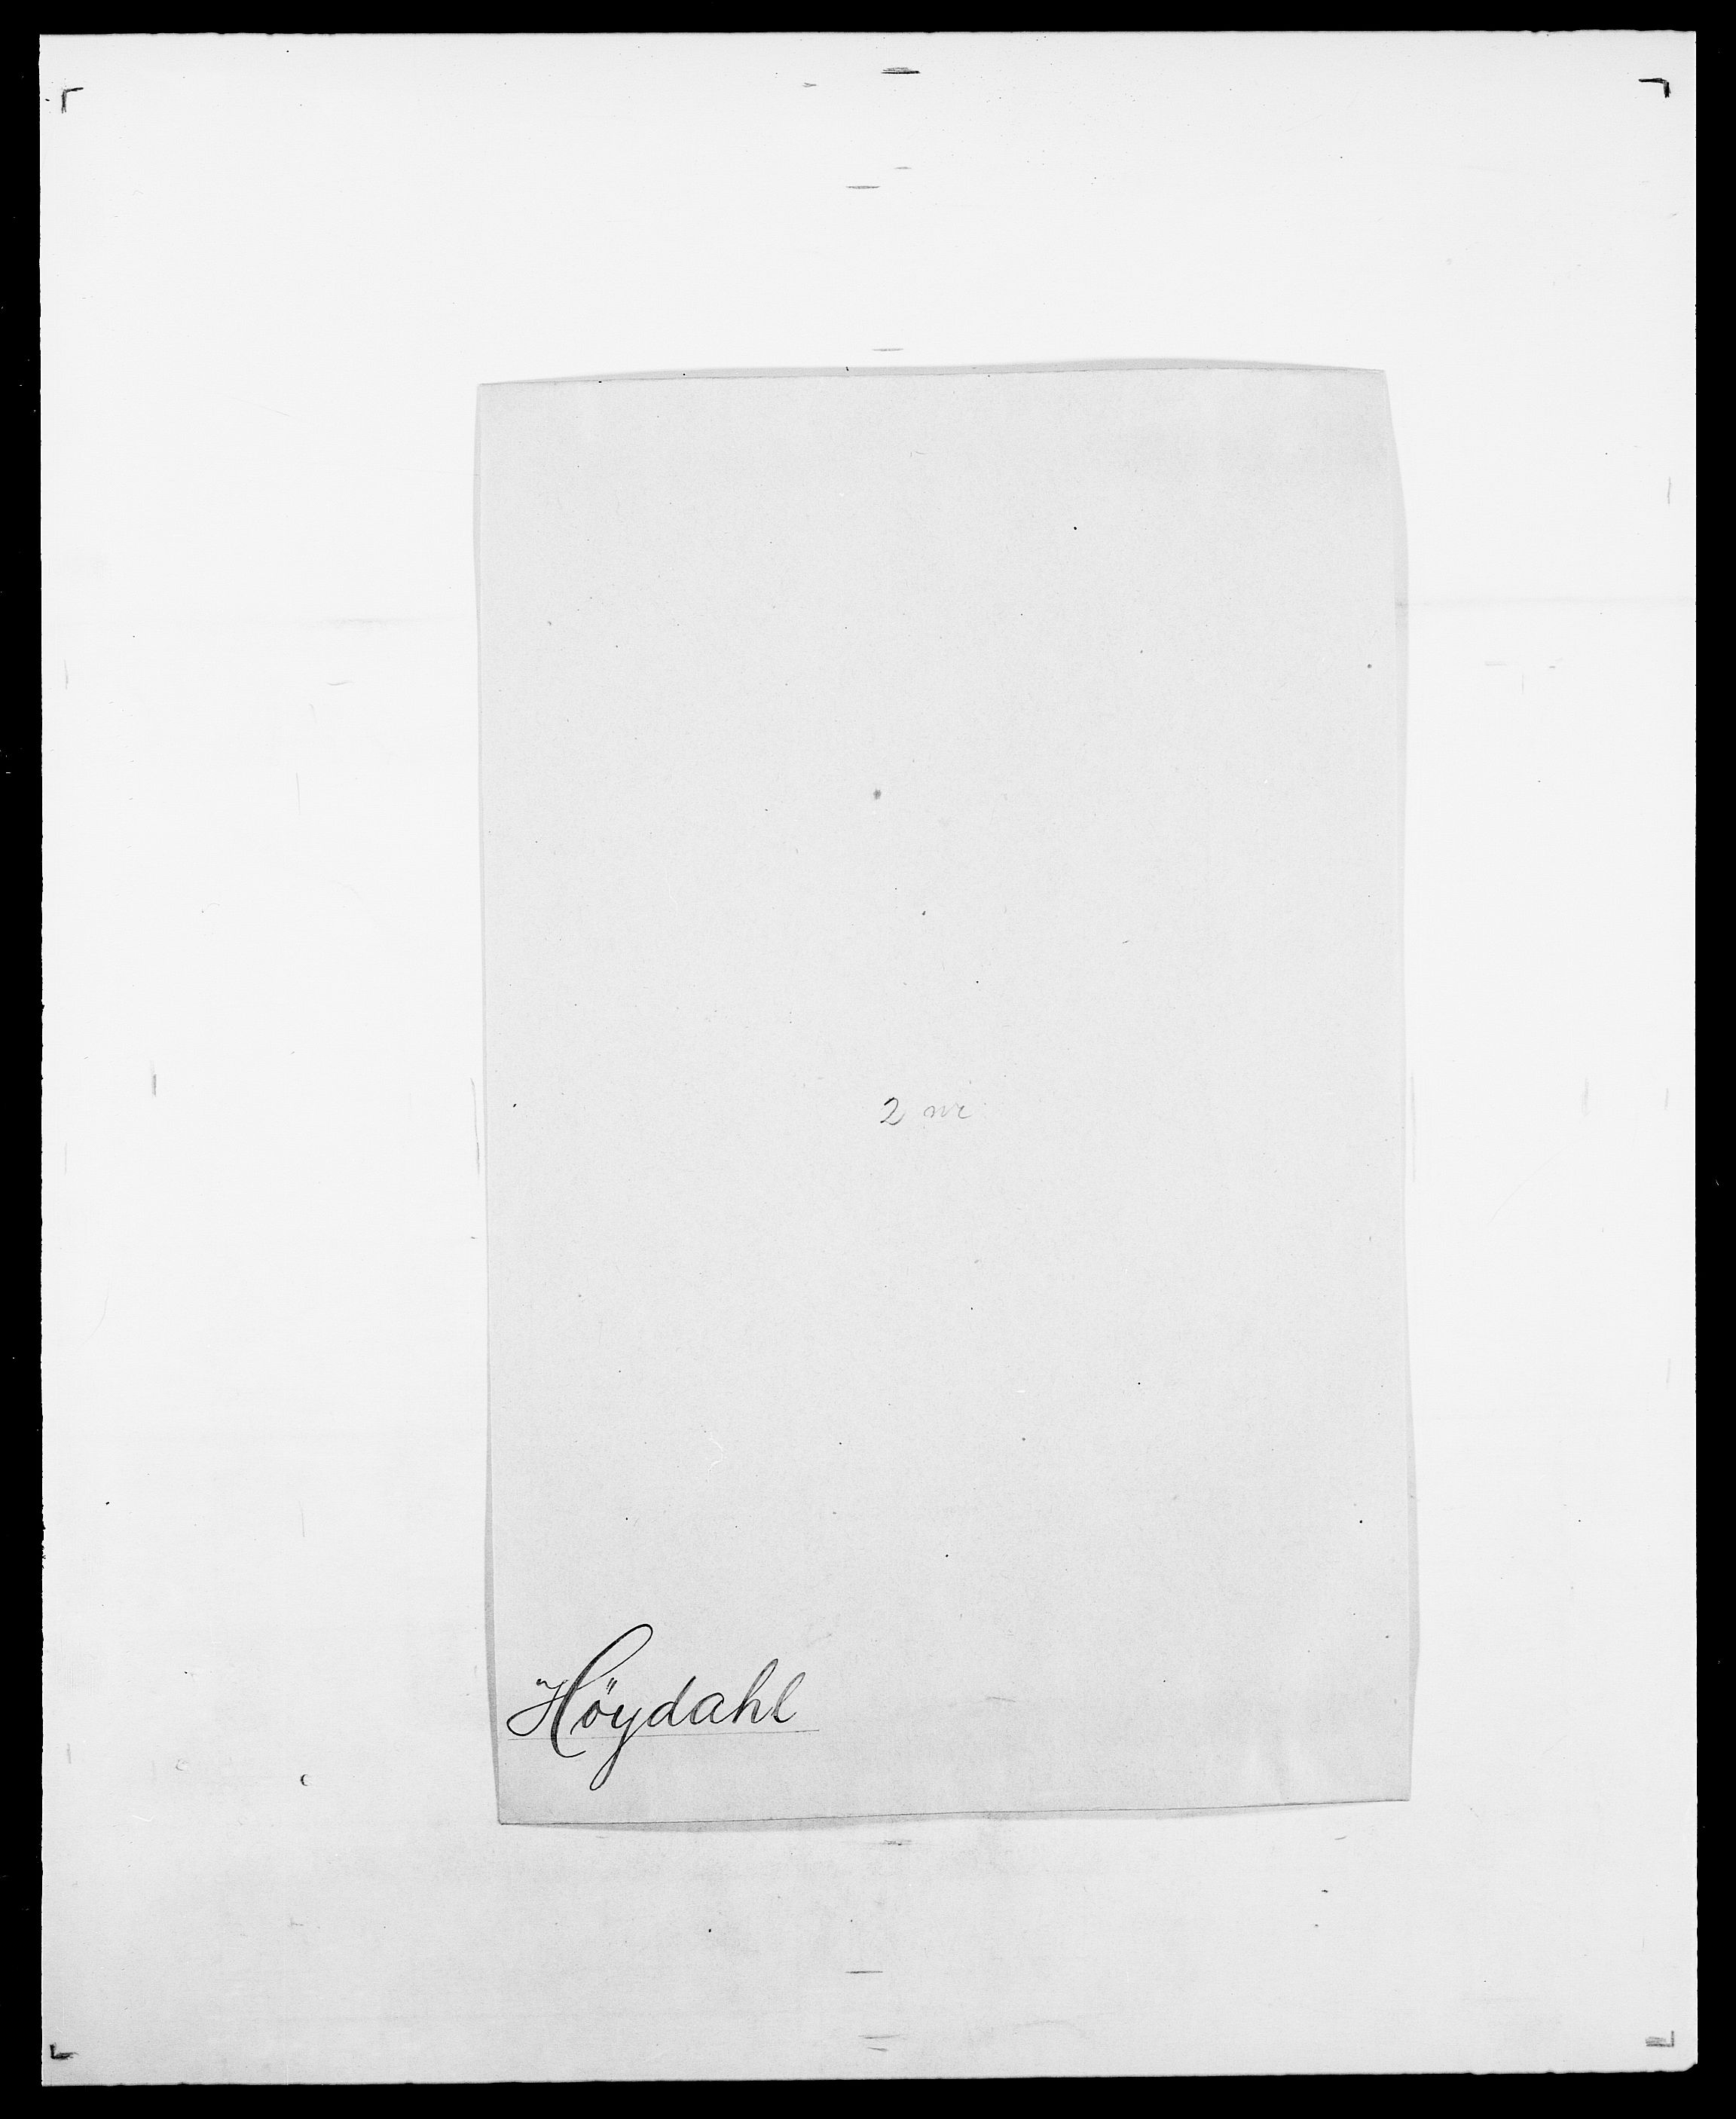 SAO, Delgobe, Charles Antoine - samling, D/Da/L0019: van der Hude - Joys, s. 406